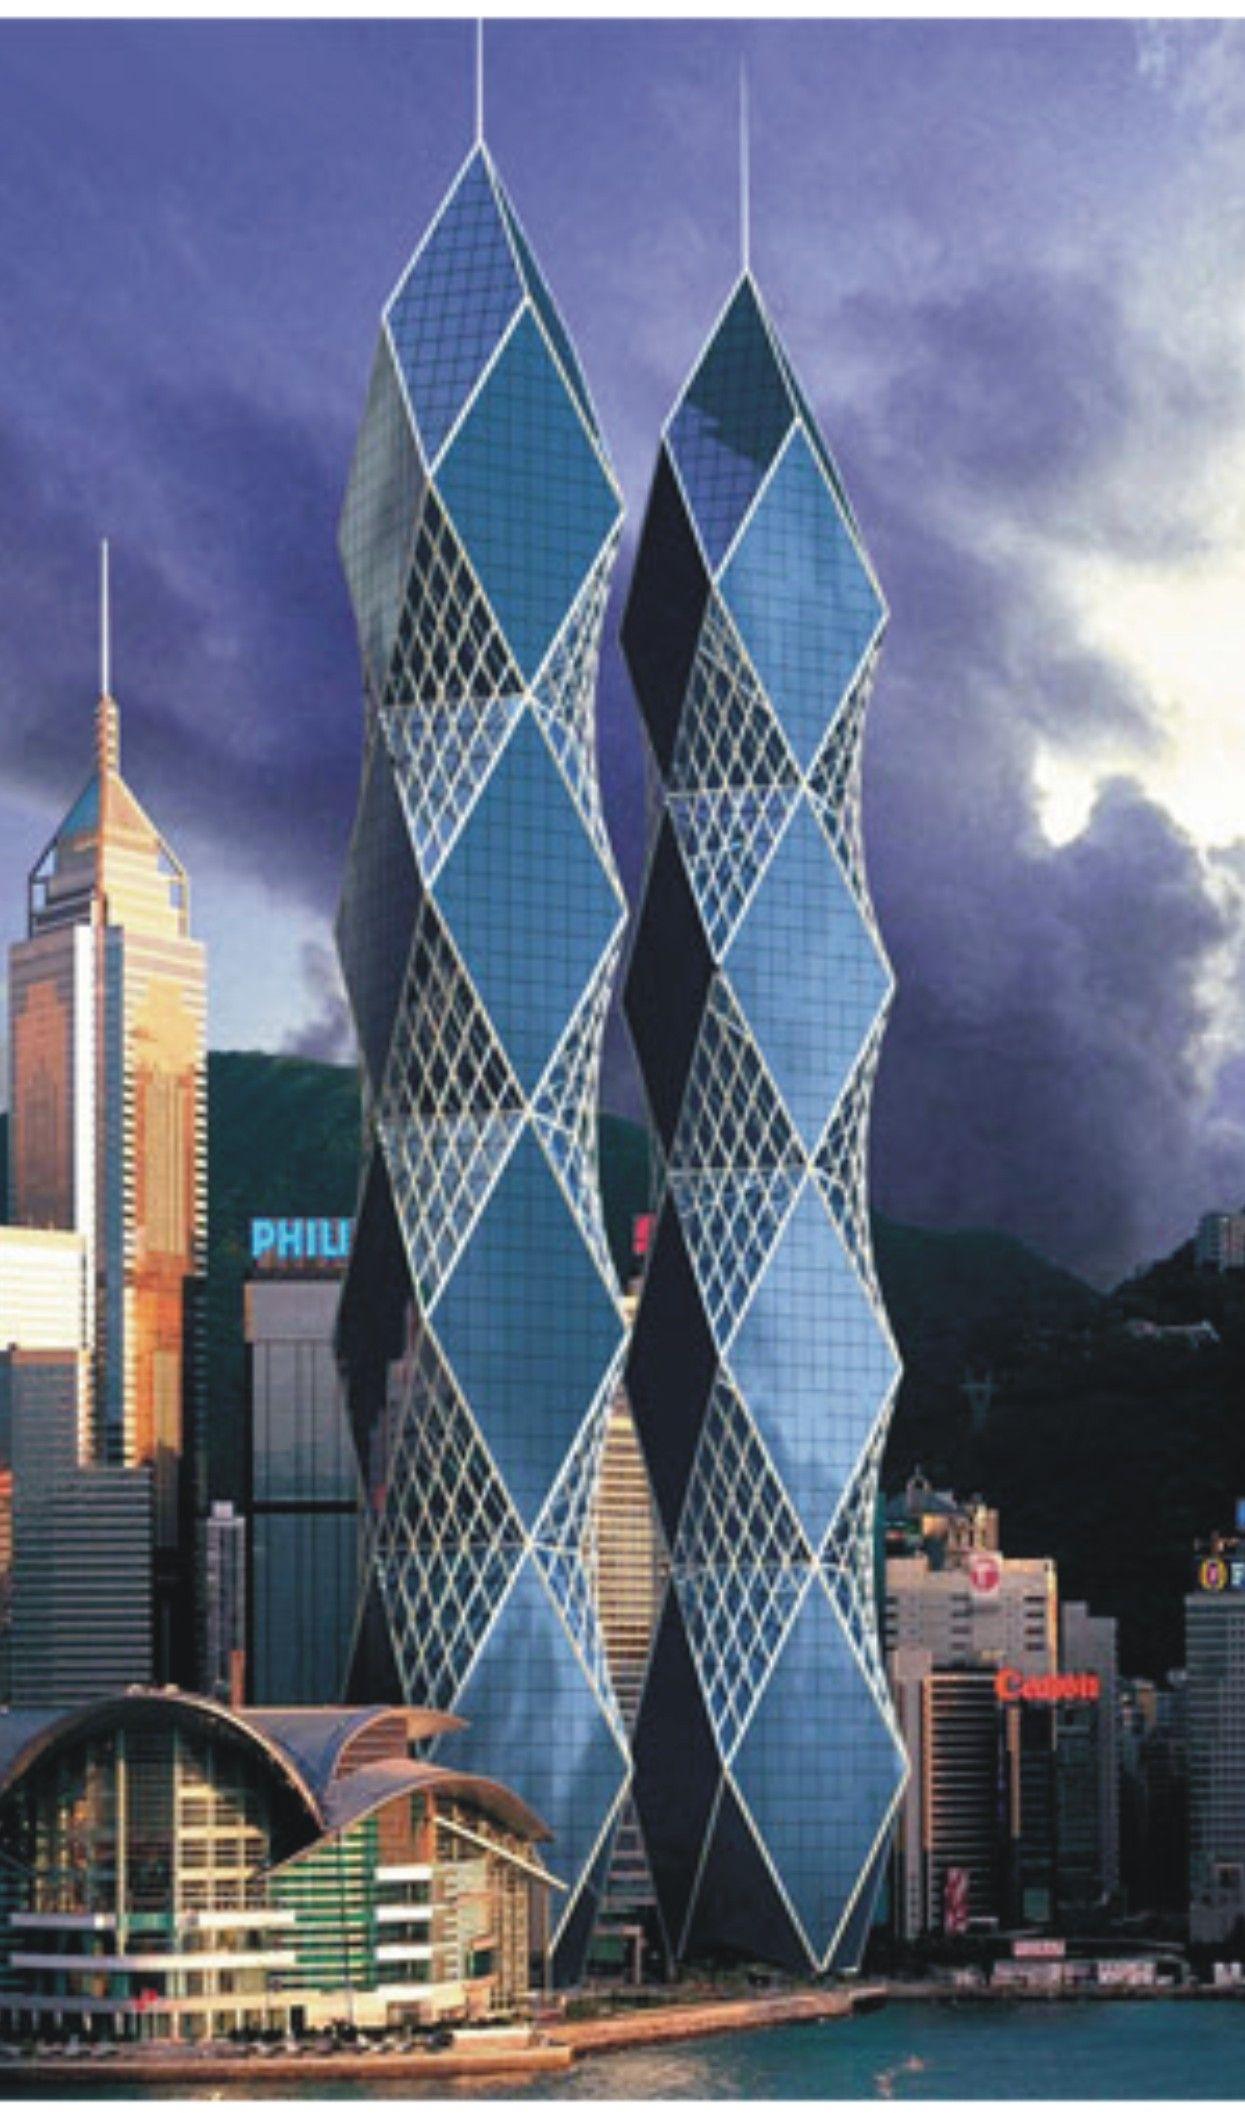 Pin by salaheddin m kayyal on skyscrapers towers - Architektonische meisterwerke ...